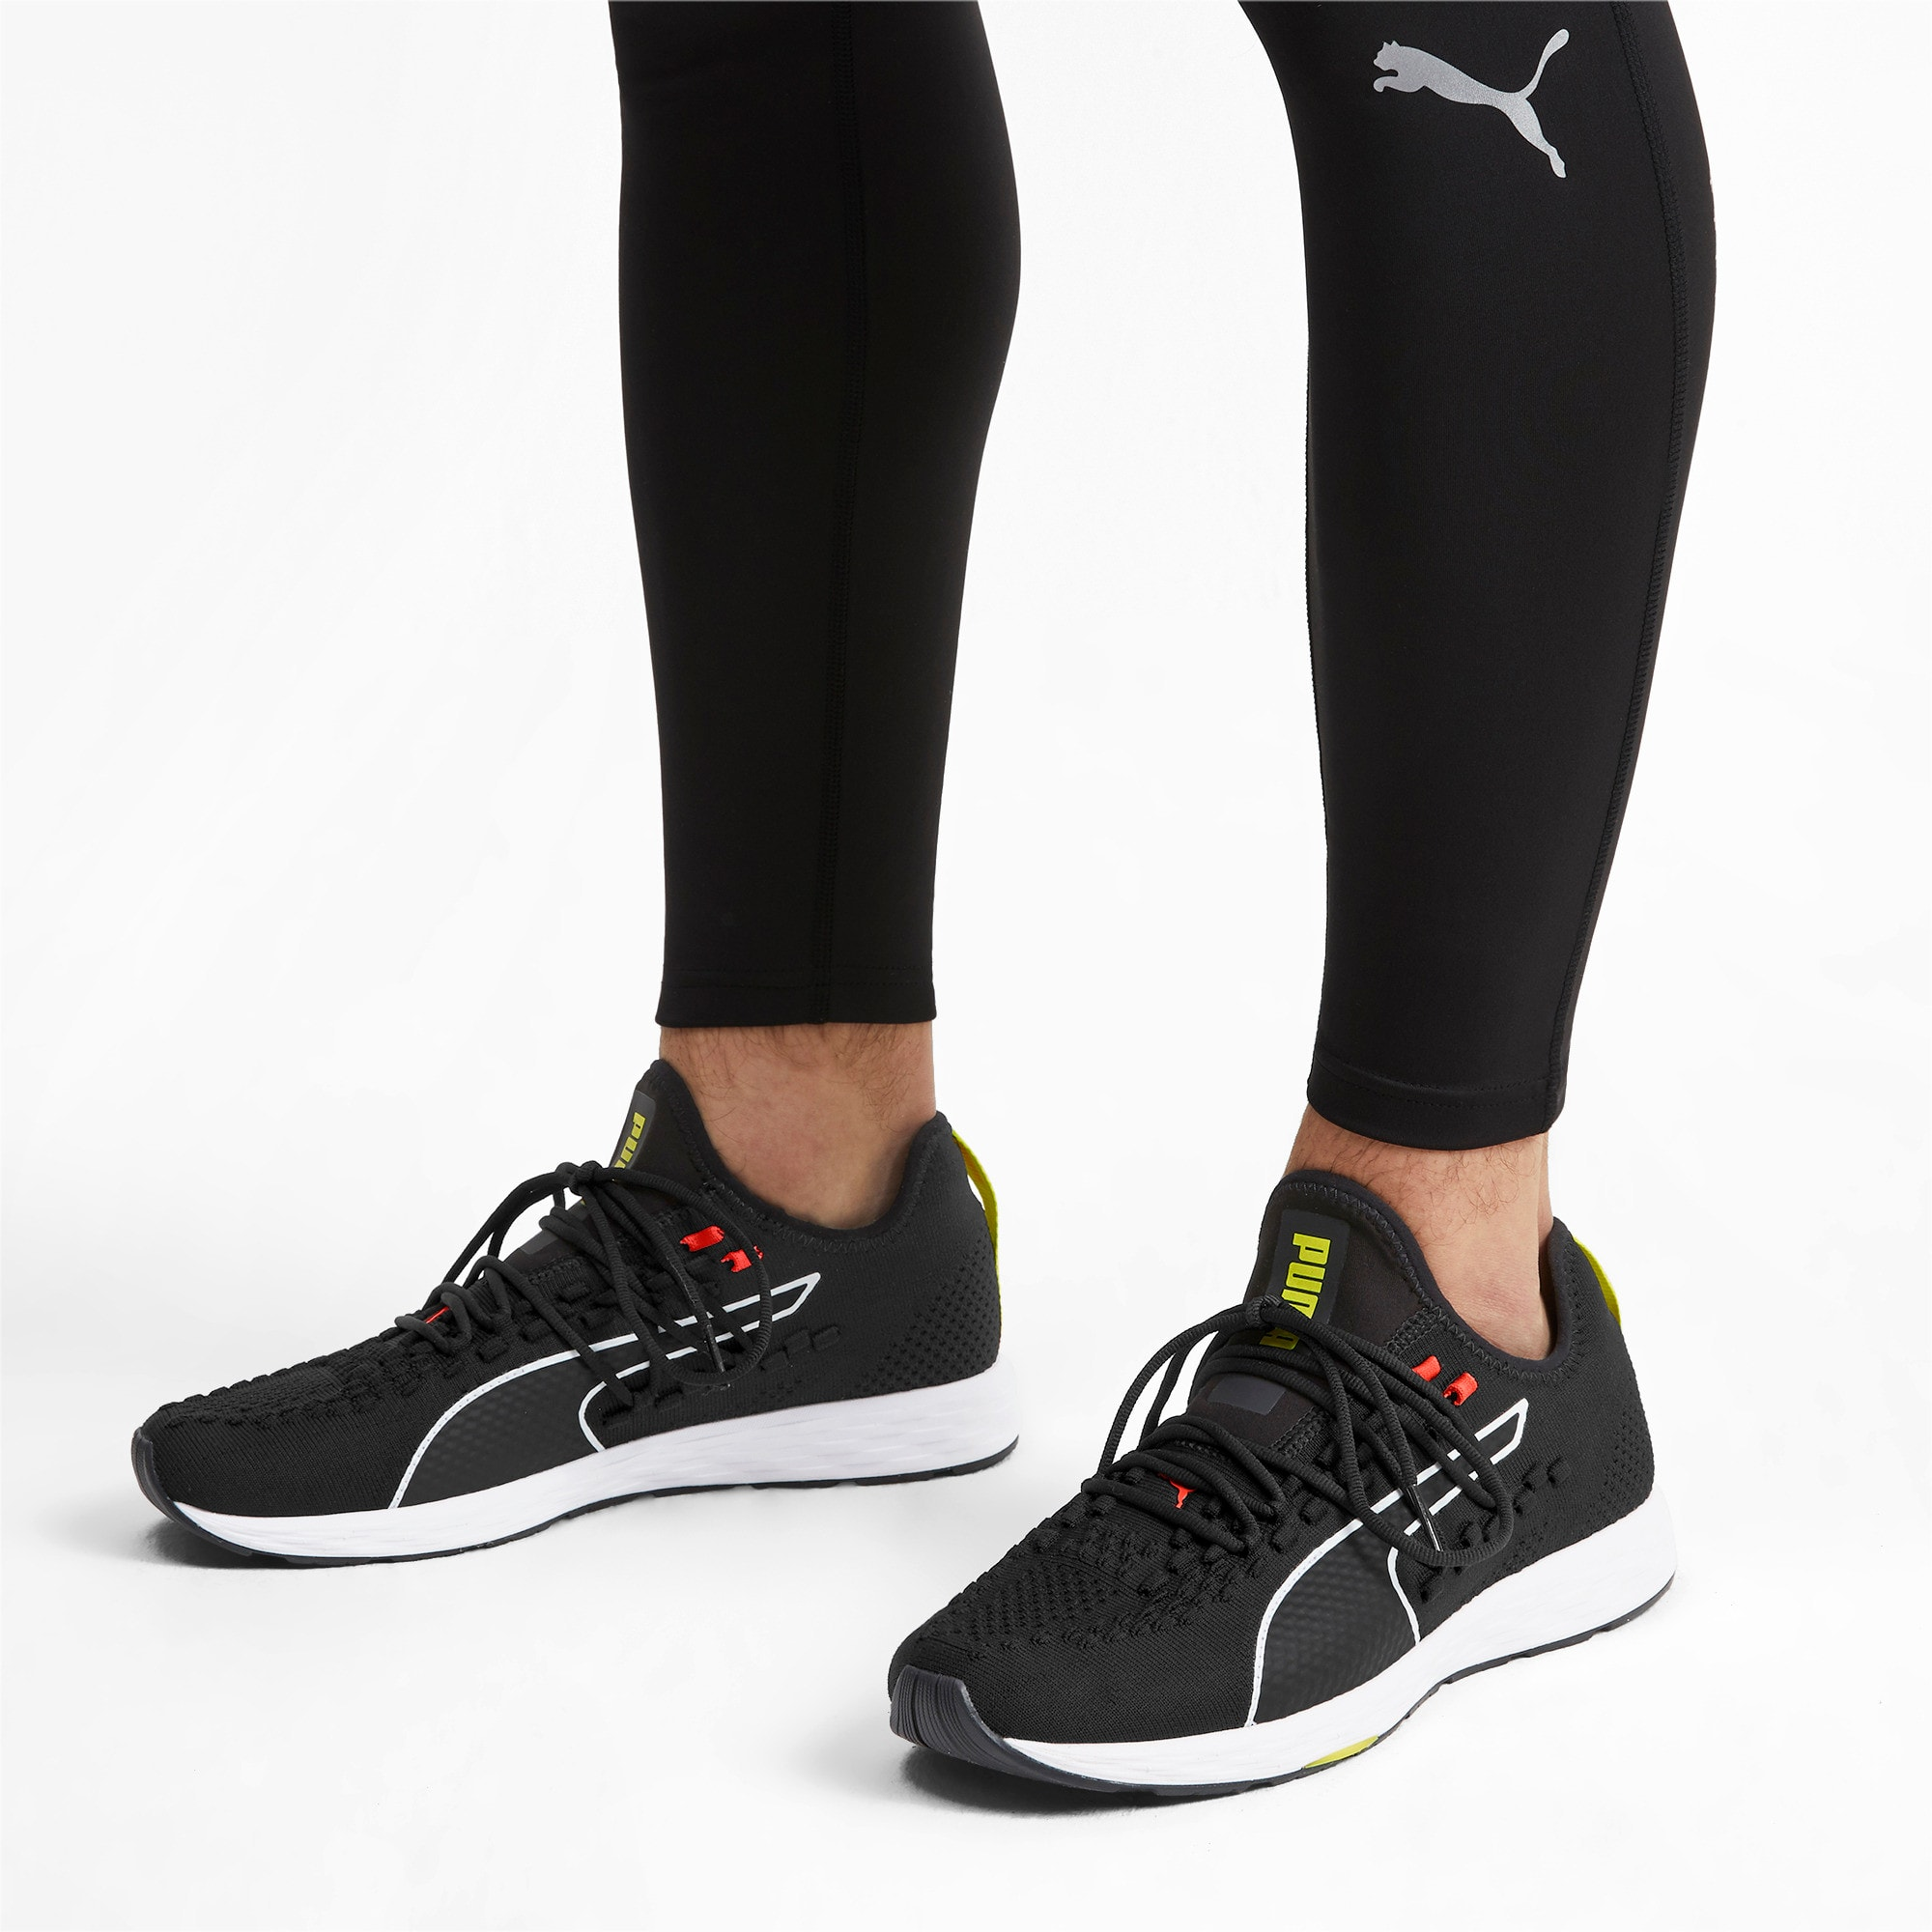 Thumbnail 2 of SPEED RACER Men's Running Shoes, Black-Nrgy Red-Yellow Alert, medium